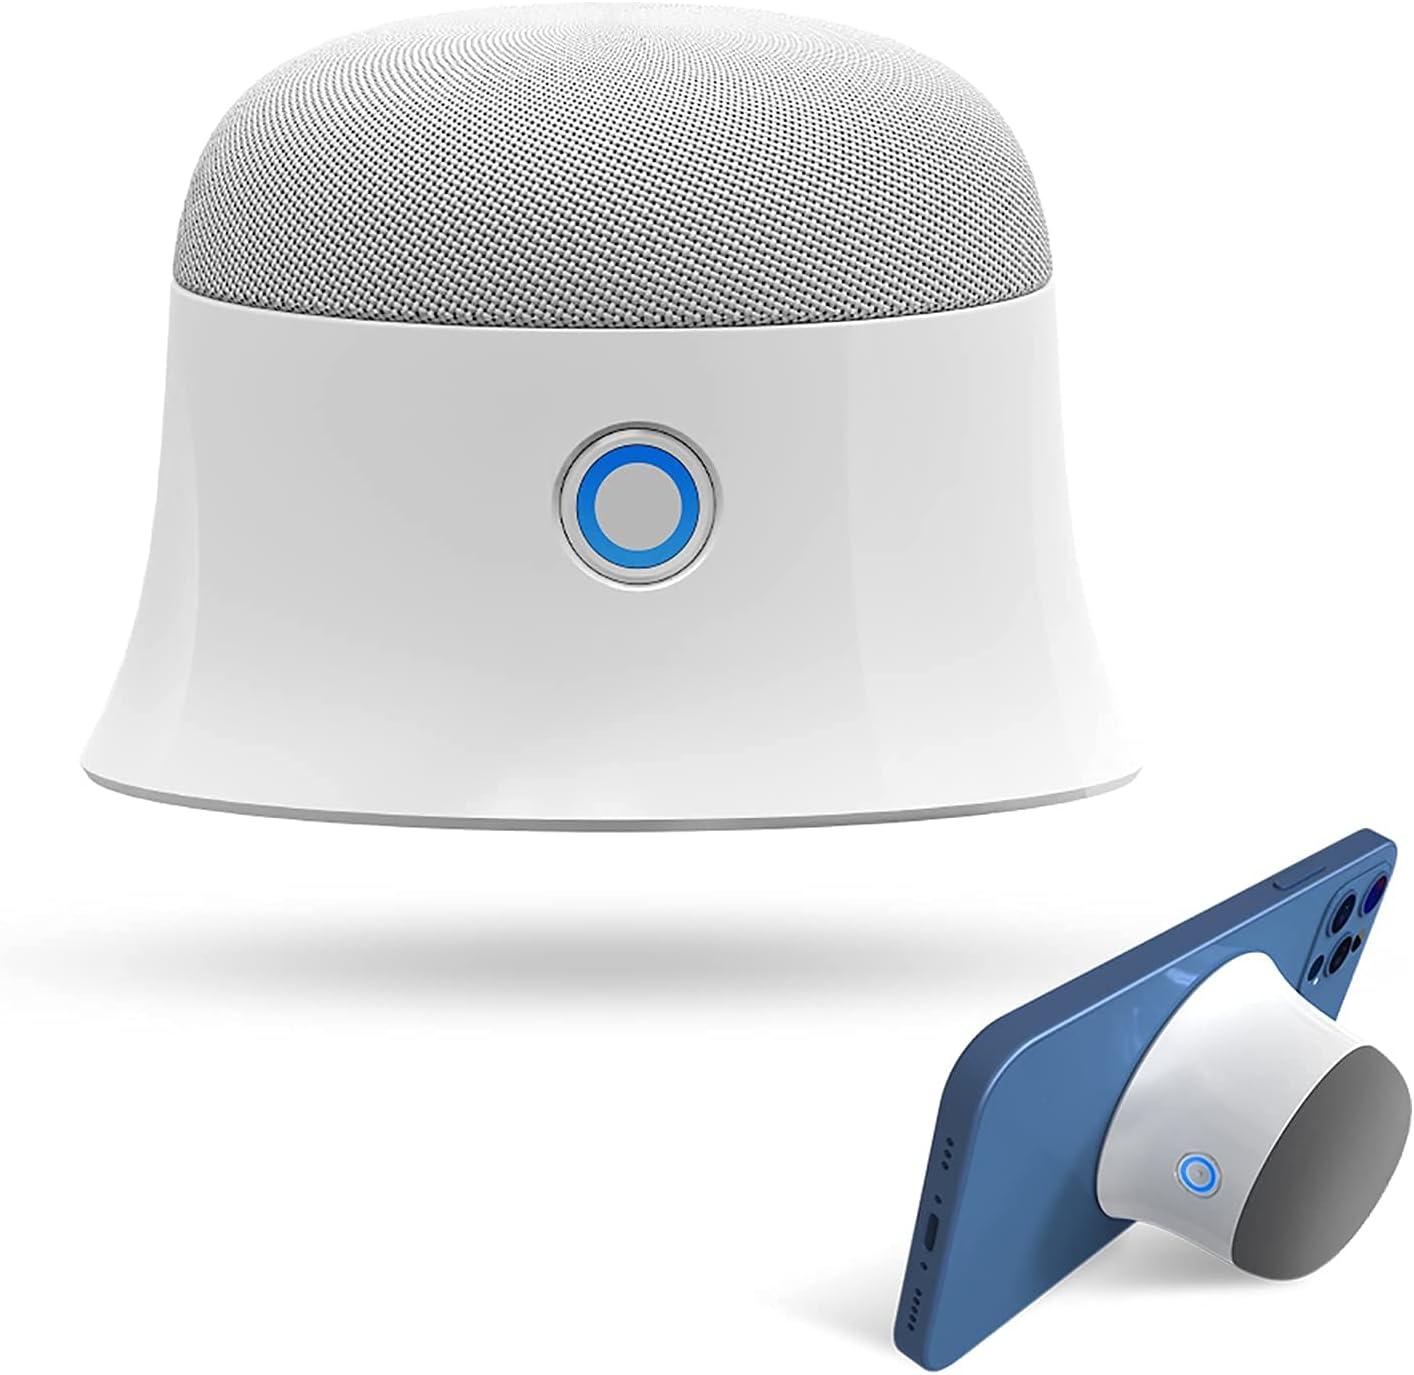 Mini Magnetic Bluetooth Speaker, Small Shower Speaker, Extra Bass Wireless Portable Speaker MagSafe Bluetooth Speaker Compatible with iPhone 12/12 Mini/12 Pro/12 Pro Max (White)